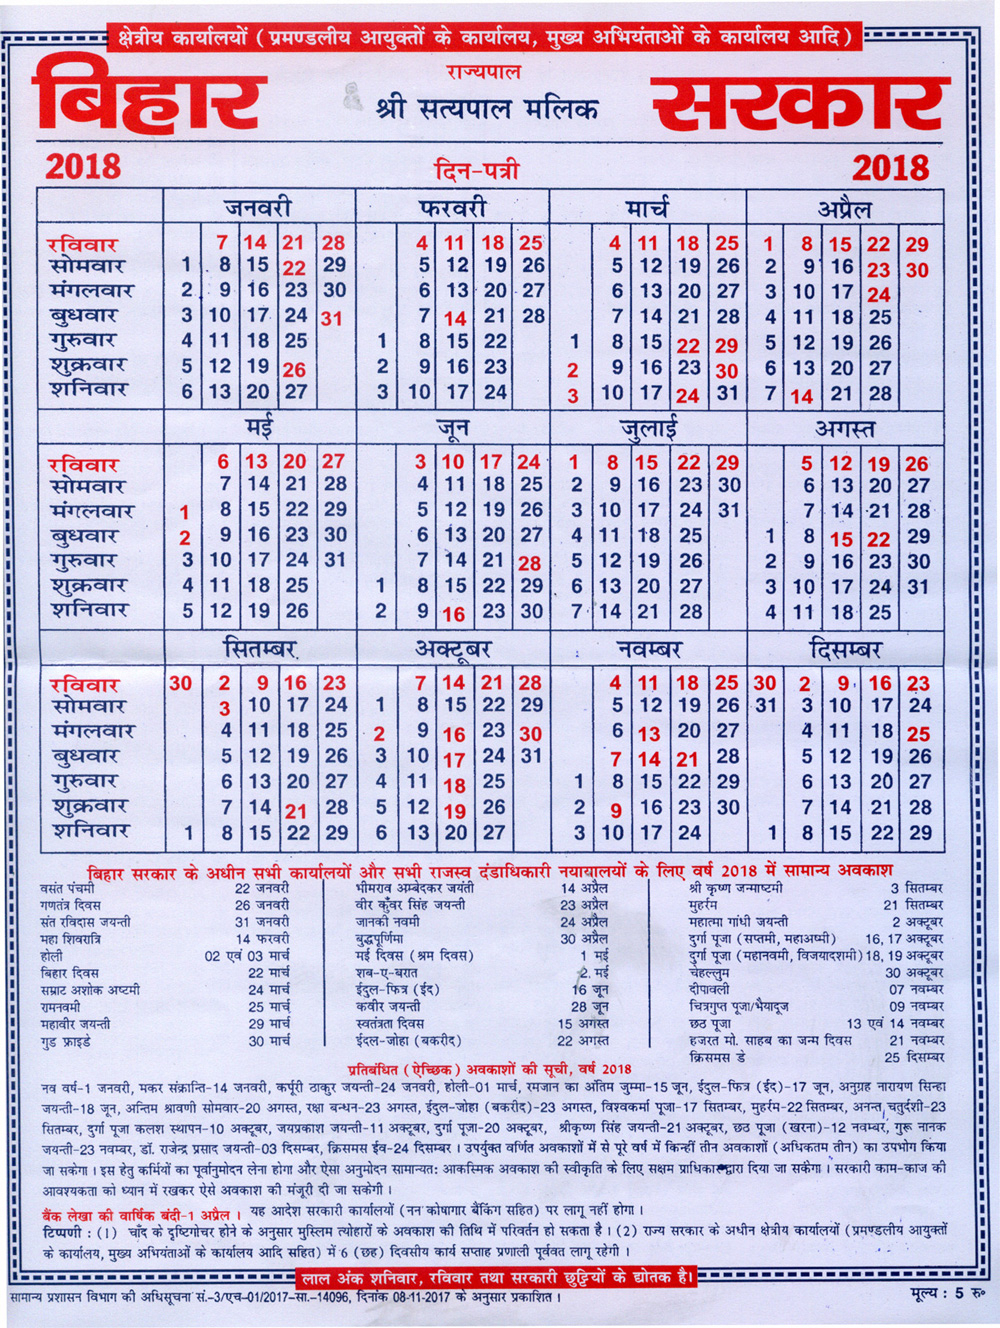 Bihar Govt. Calendar 2018, Bihar Govt. Holiday List, Holiday for Bihar Government Calendar 2020